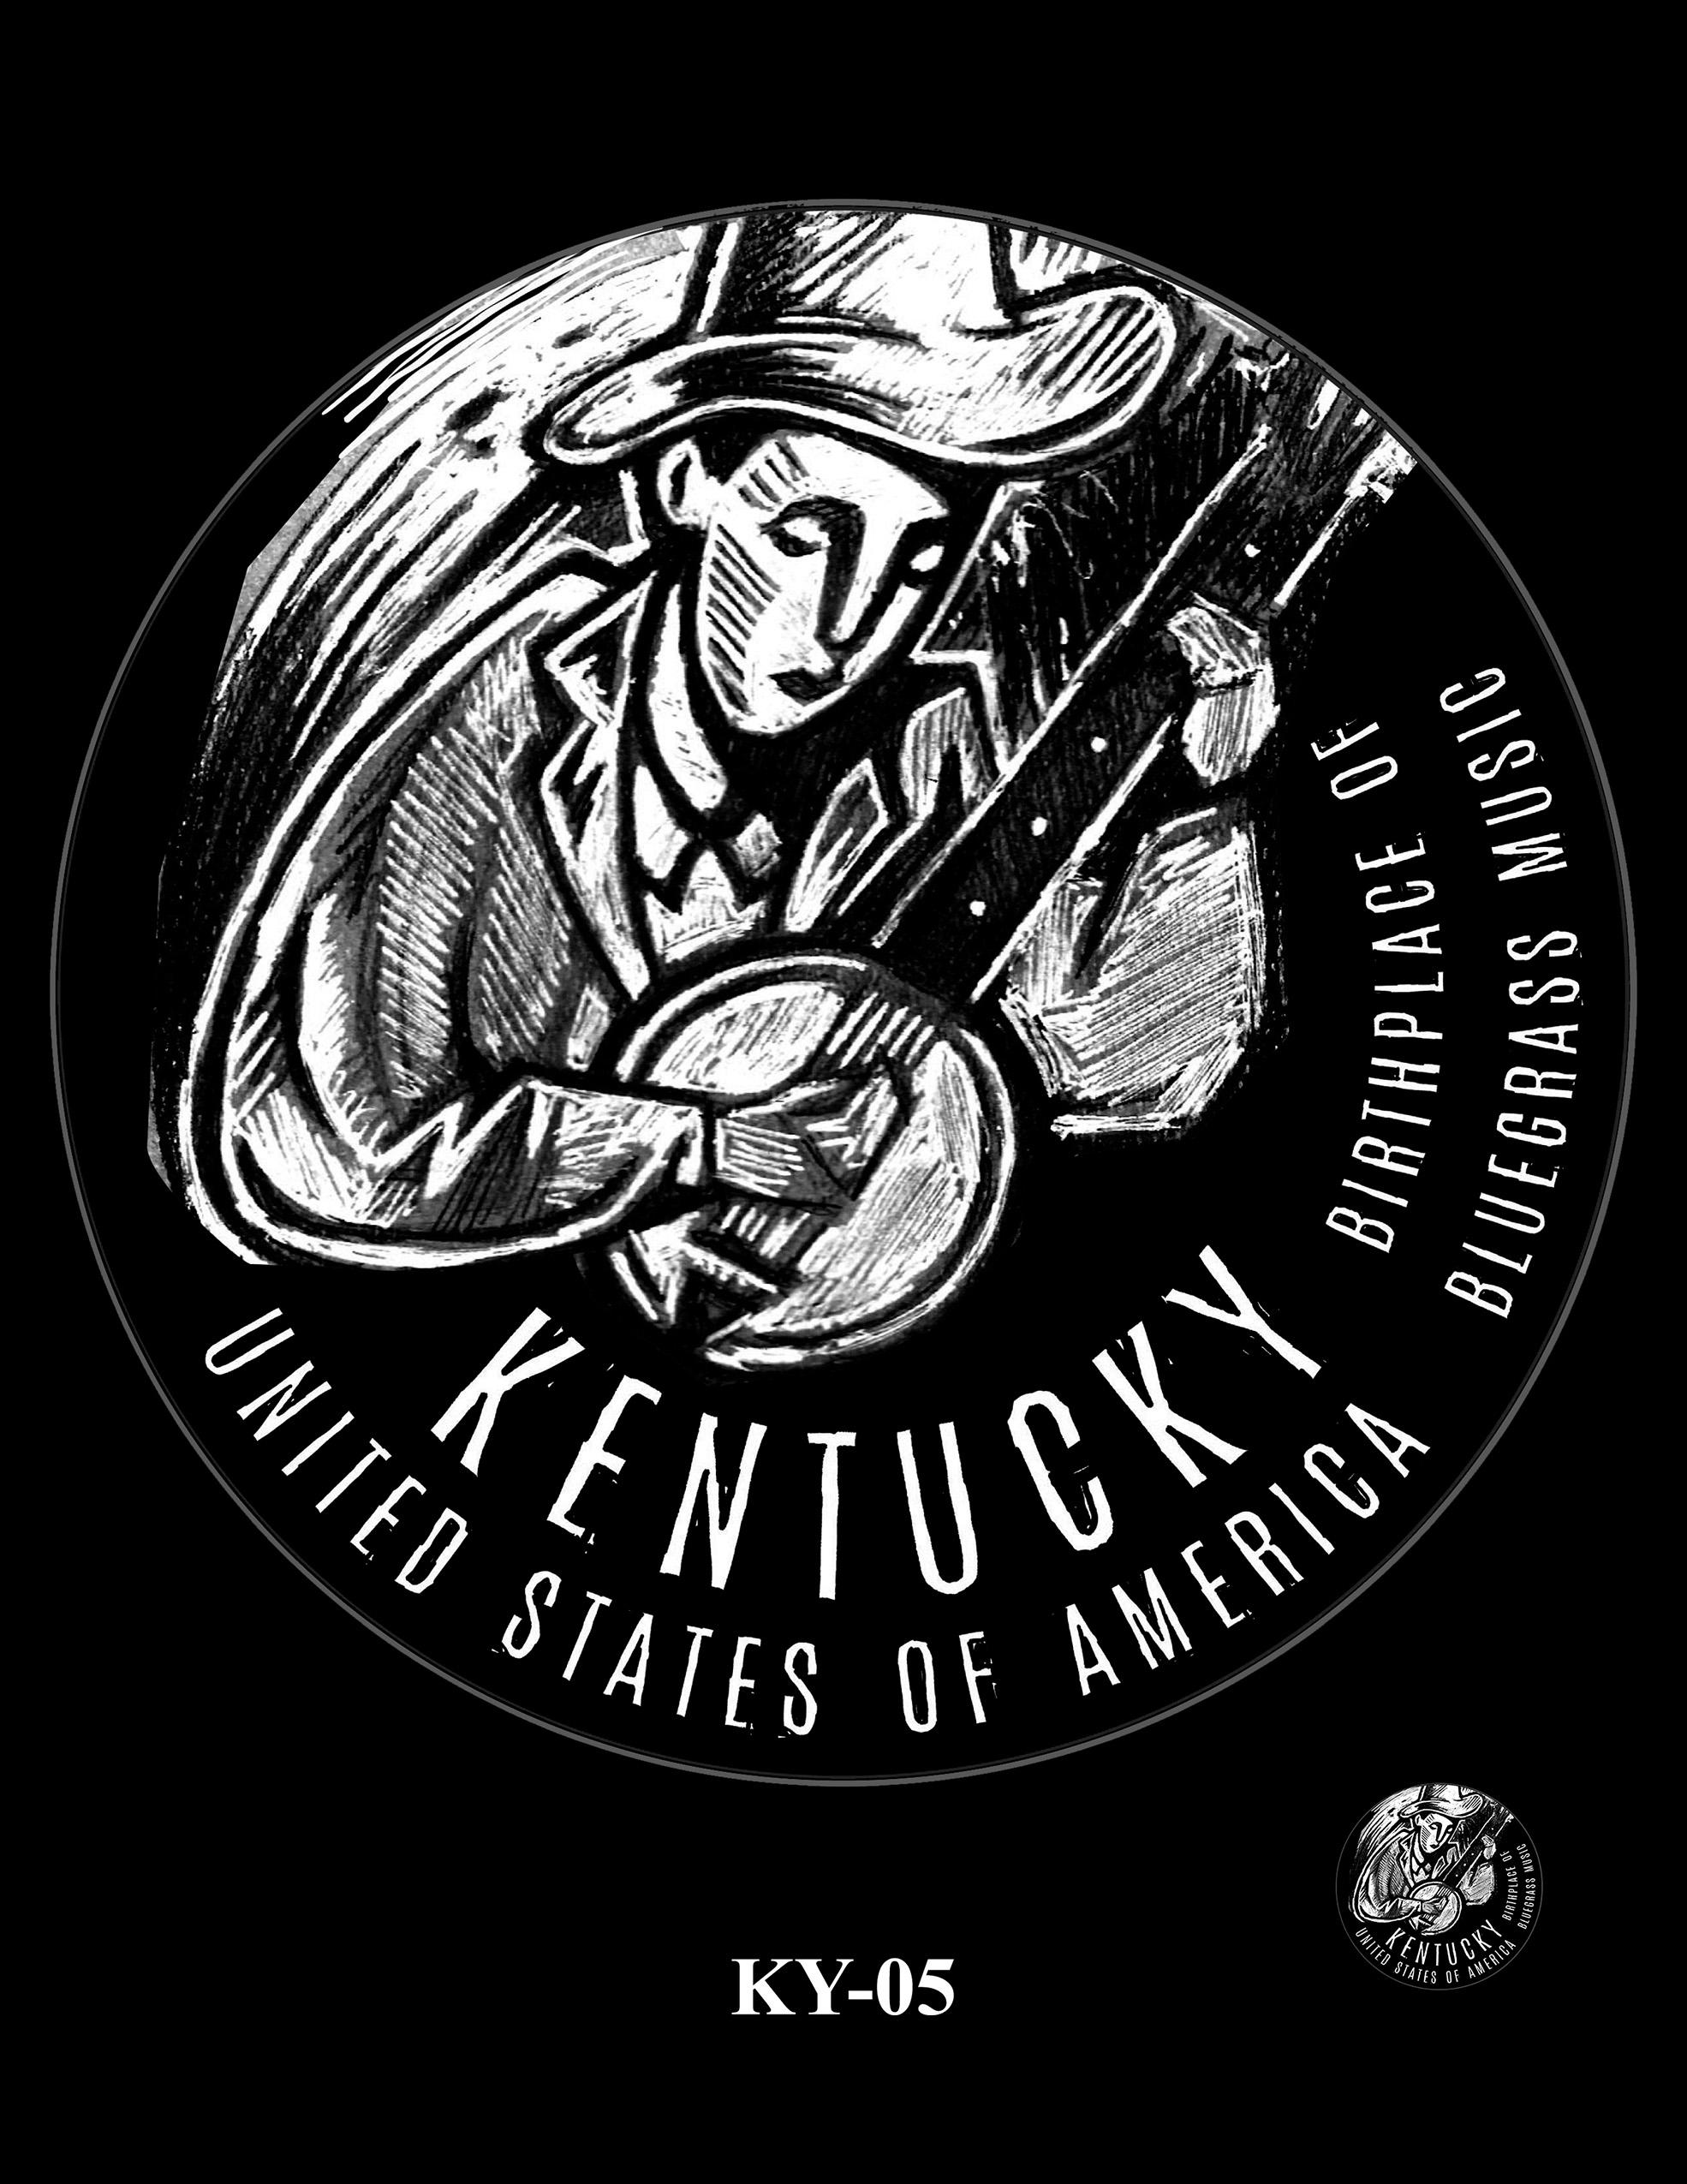 KY-05 -- 2022 American Innovation $1 Coin - Kentucky